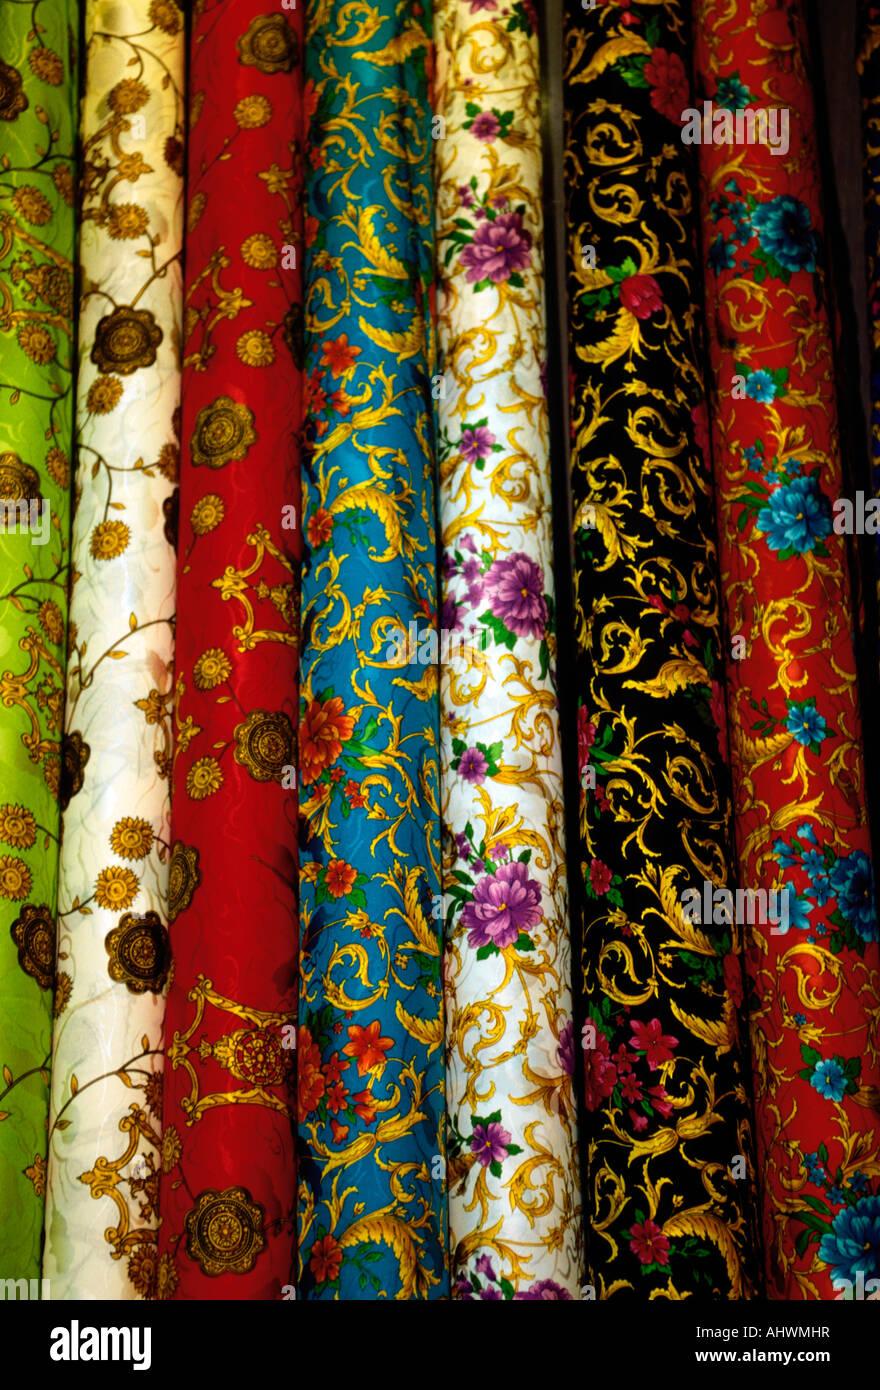 Chinese silk, Chinese silk fabric, silk fabric, Chinese silk cloth, silk cloth, bolt of silk, bolts of silk, shop, Stock Photo